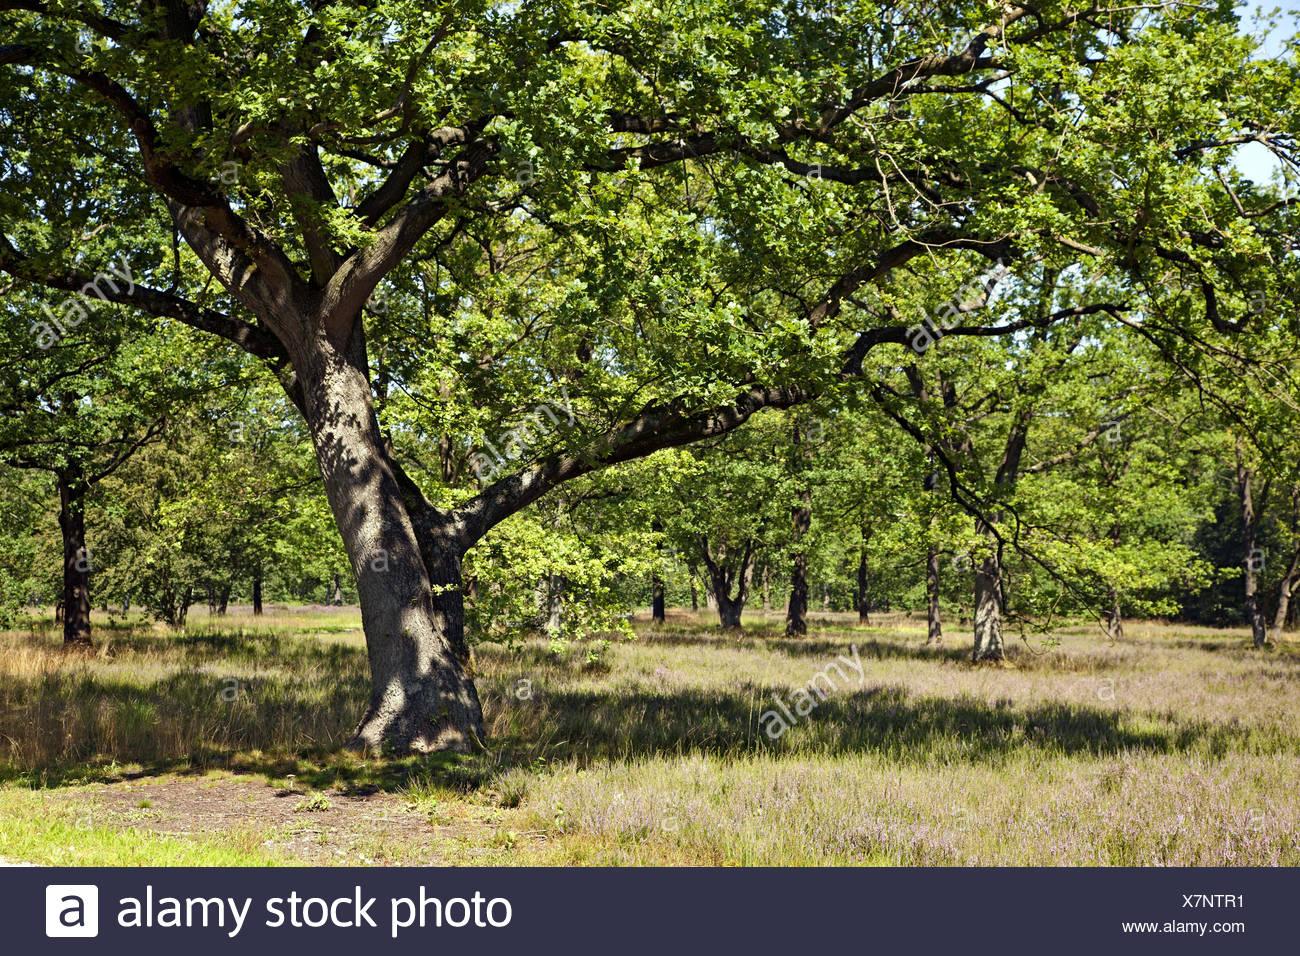 Park, tree, grass, idyll, - Stock Image